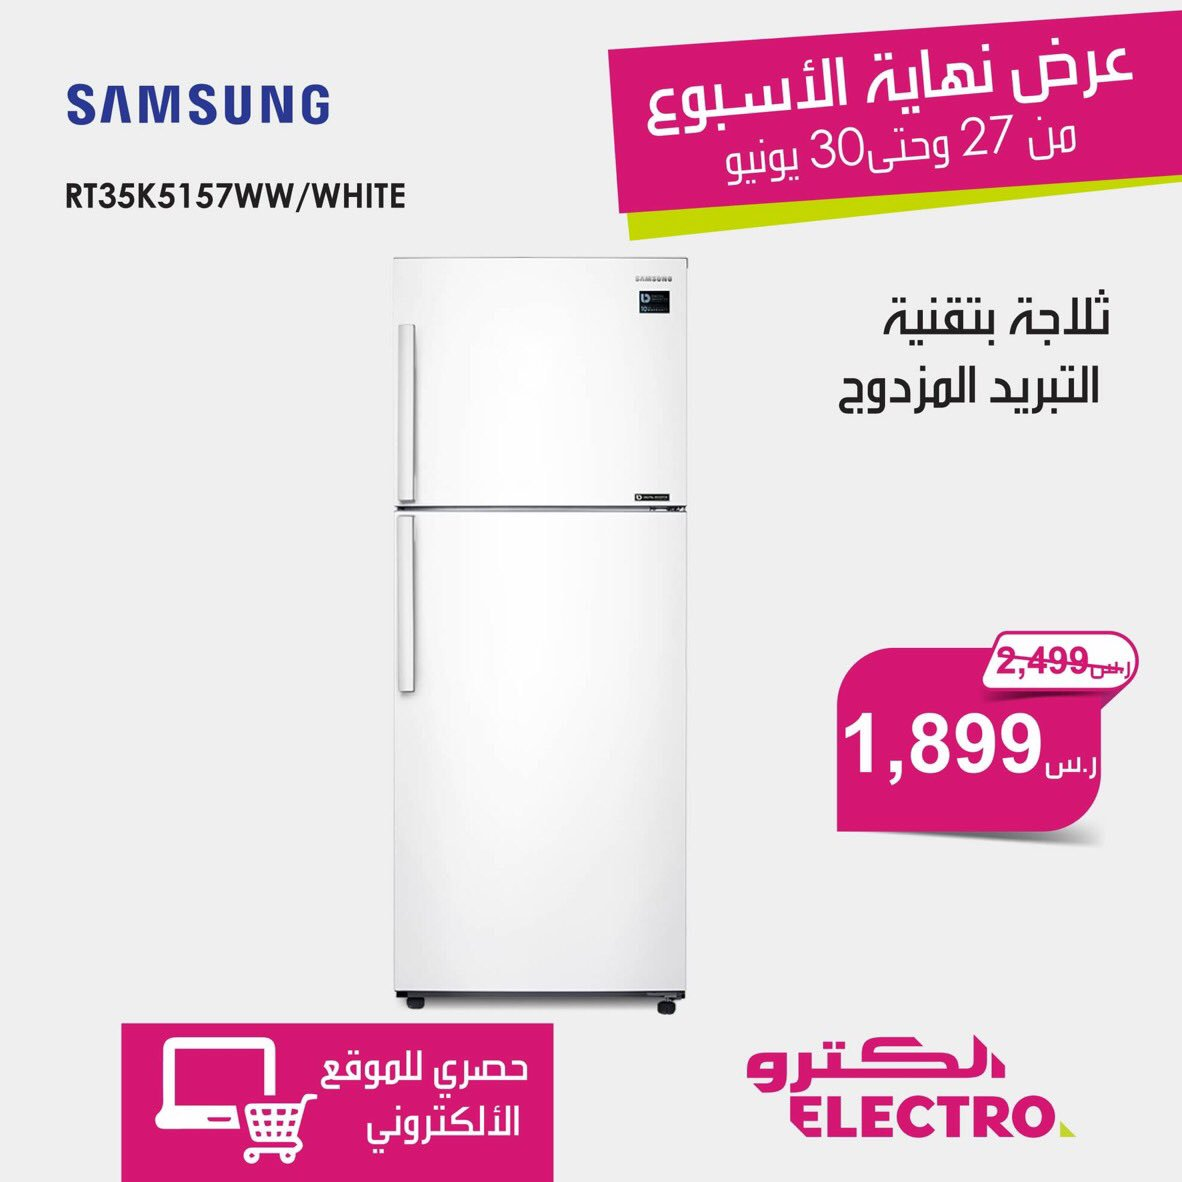 b81ac39ae #Refrigerator #OFFER #DISCOUNT #ELECTRO #Electronics #Samsung #ثلاجة #عرض # عروض #الكترو #ثلاجات #الكترونيات #خصومات #سامسونجpic.twitter.com/J84l7NmfBb